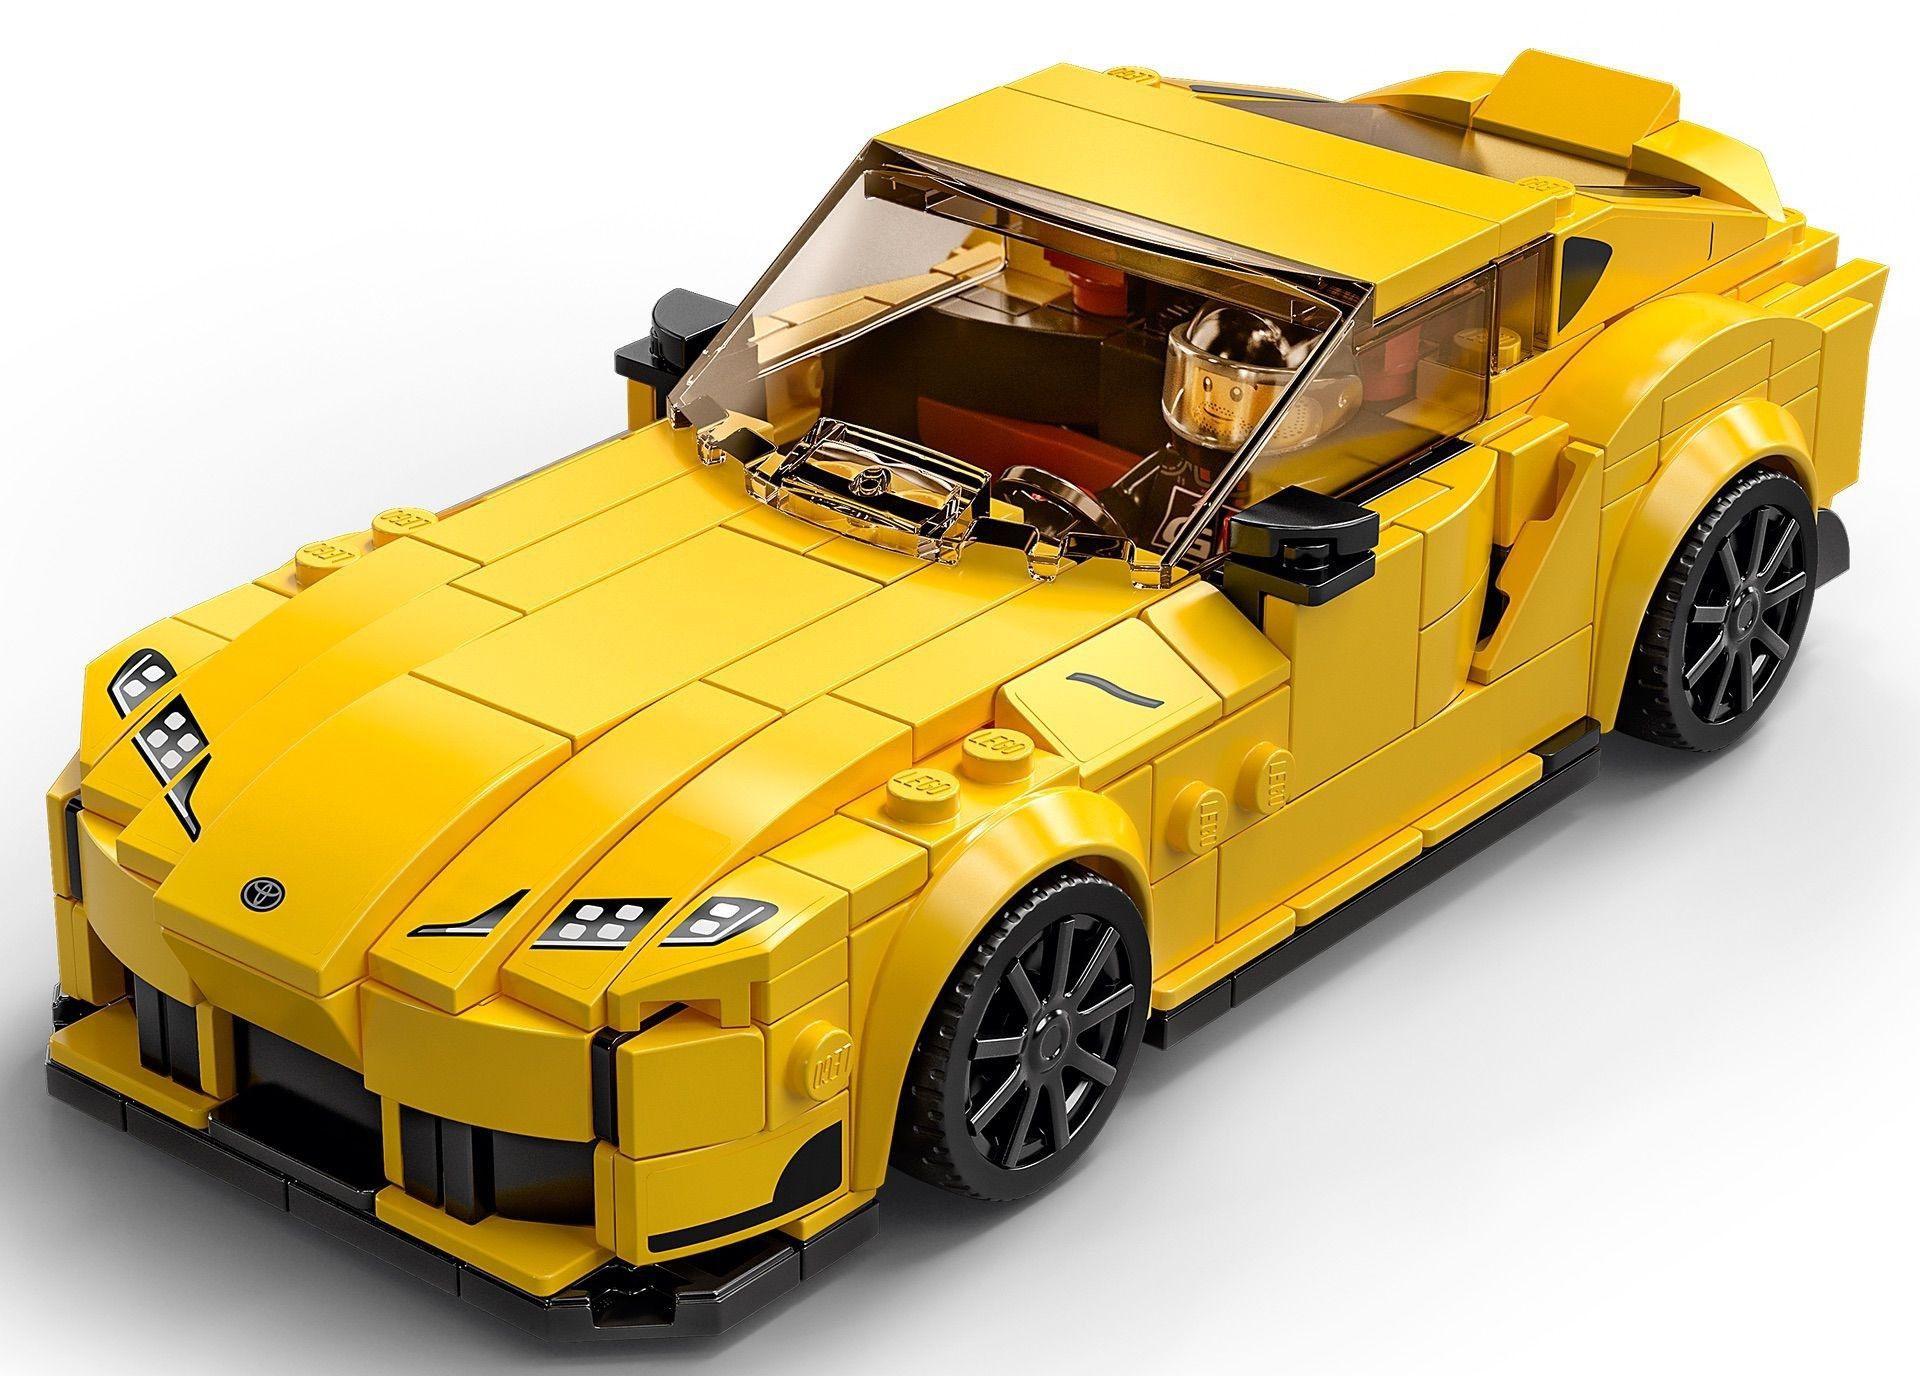 Toyota_GR_Supra_lego-0007